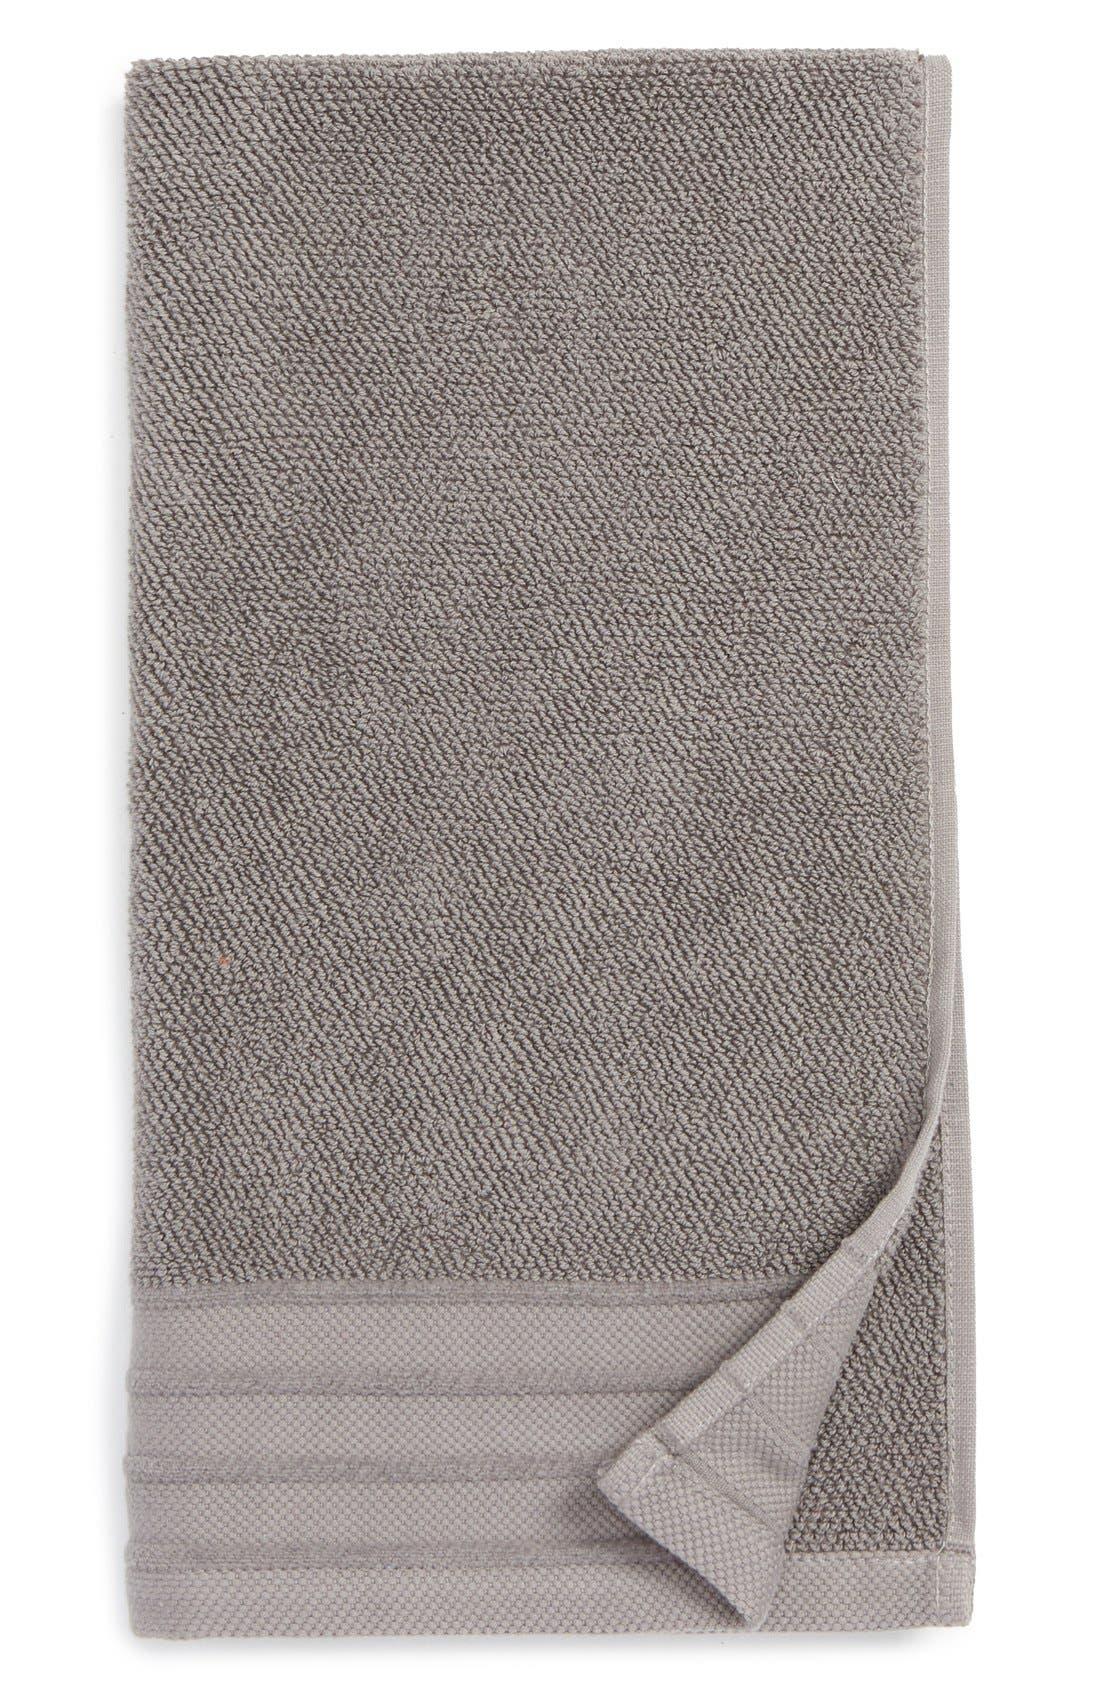 Classic Luxe Hand Towel,                             Main thumbnail 1, color,                             GRANITE